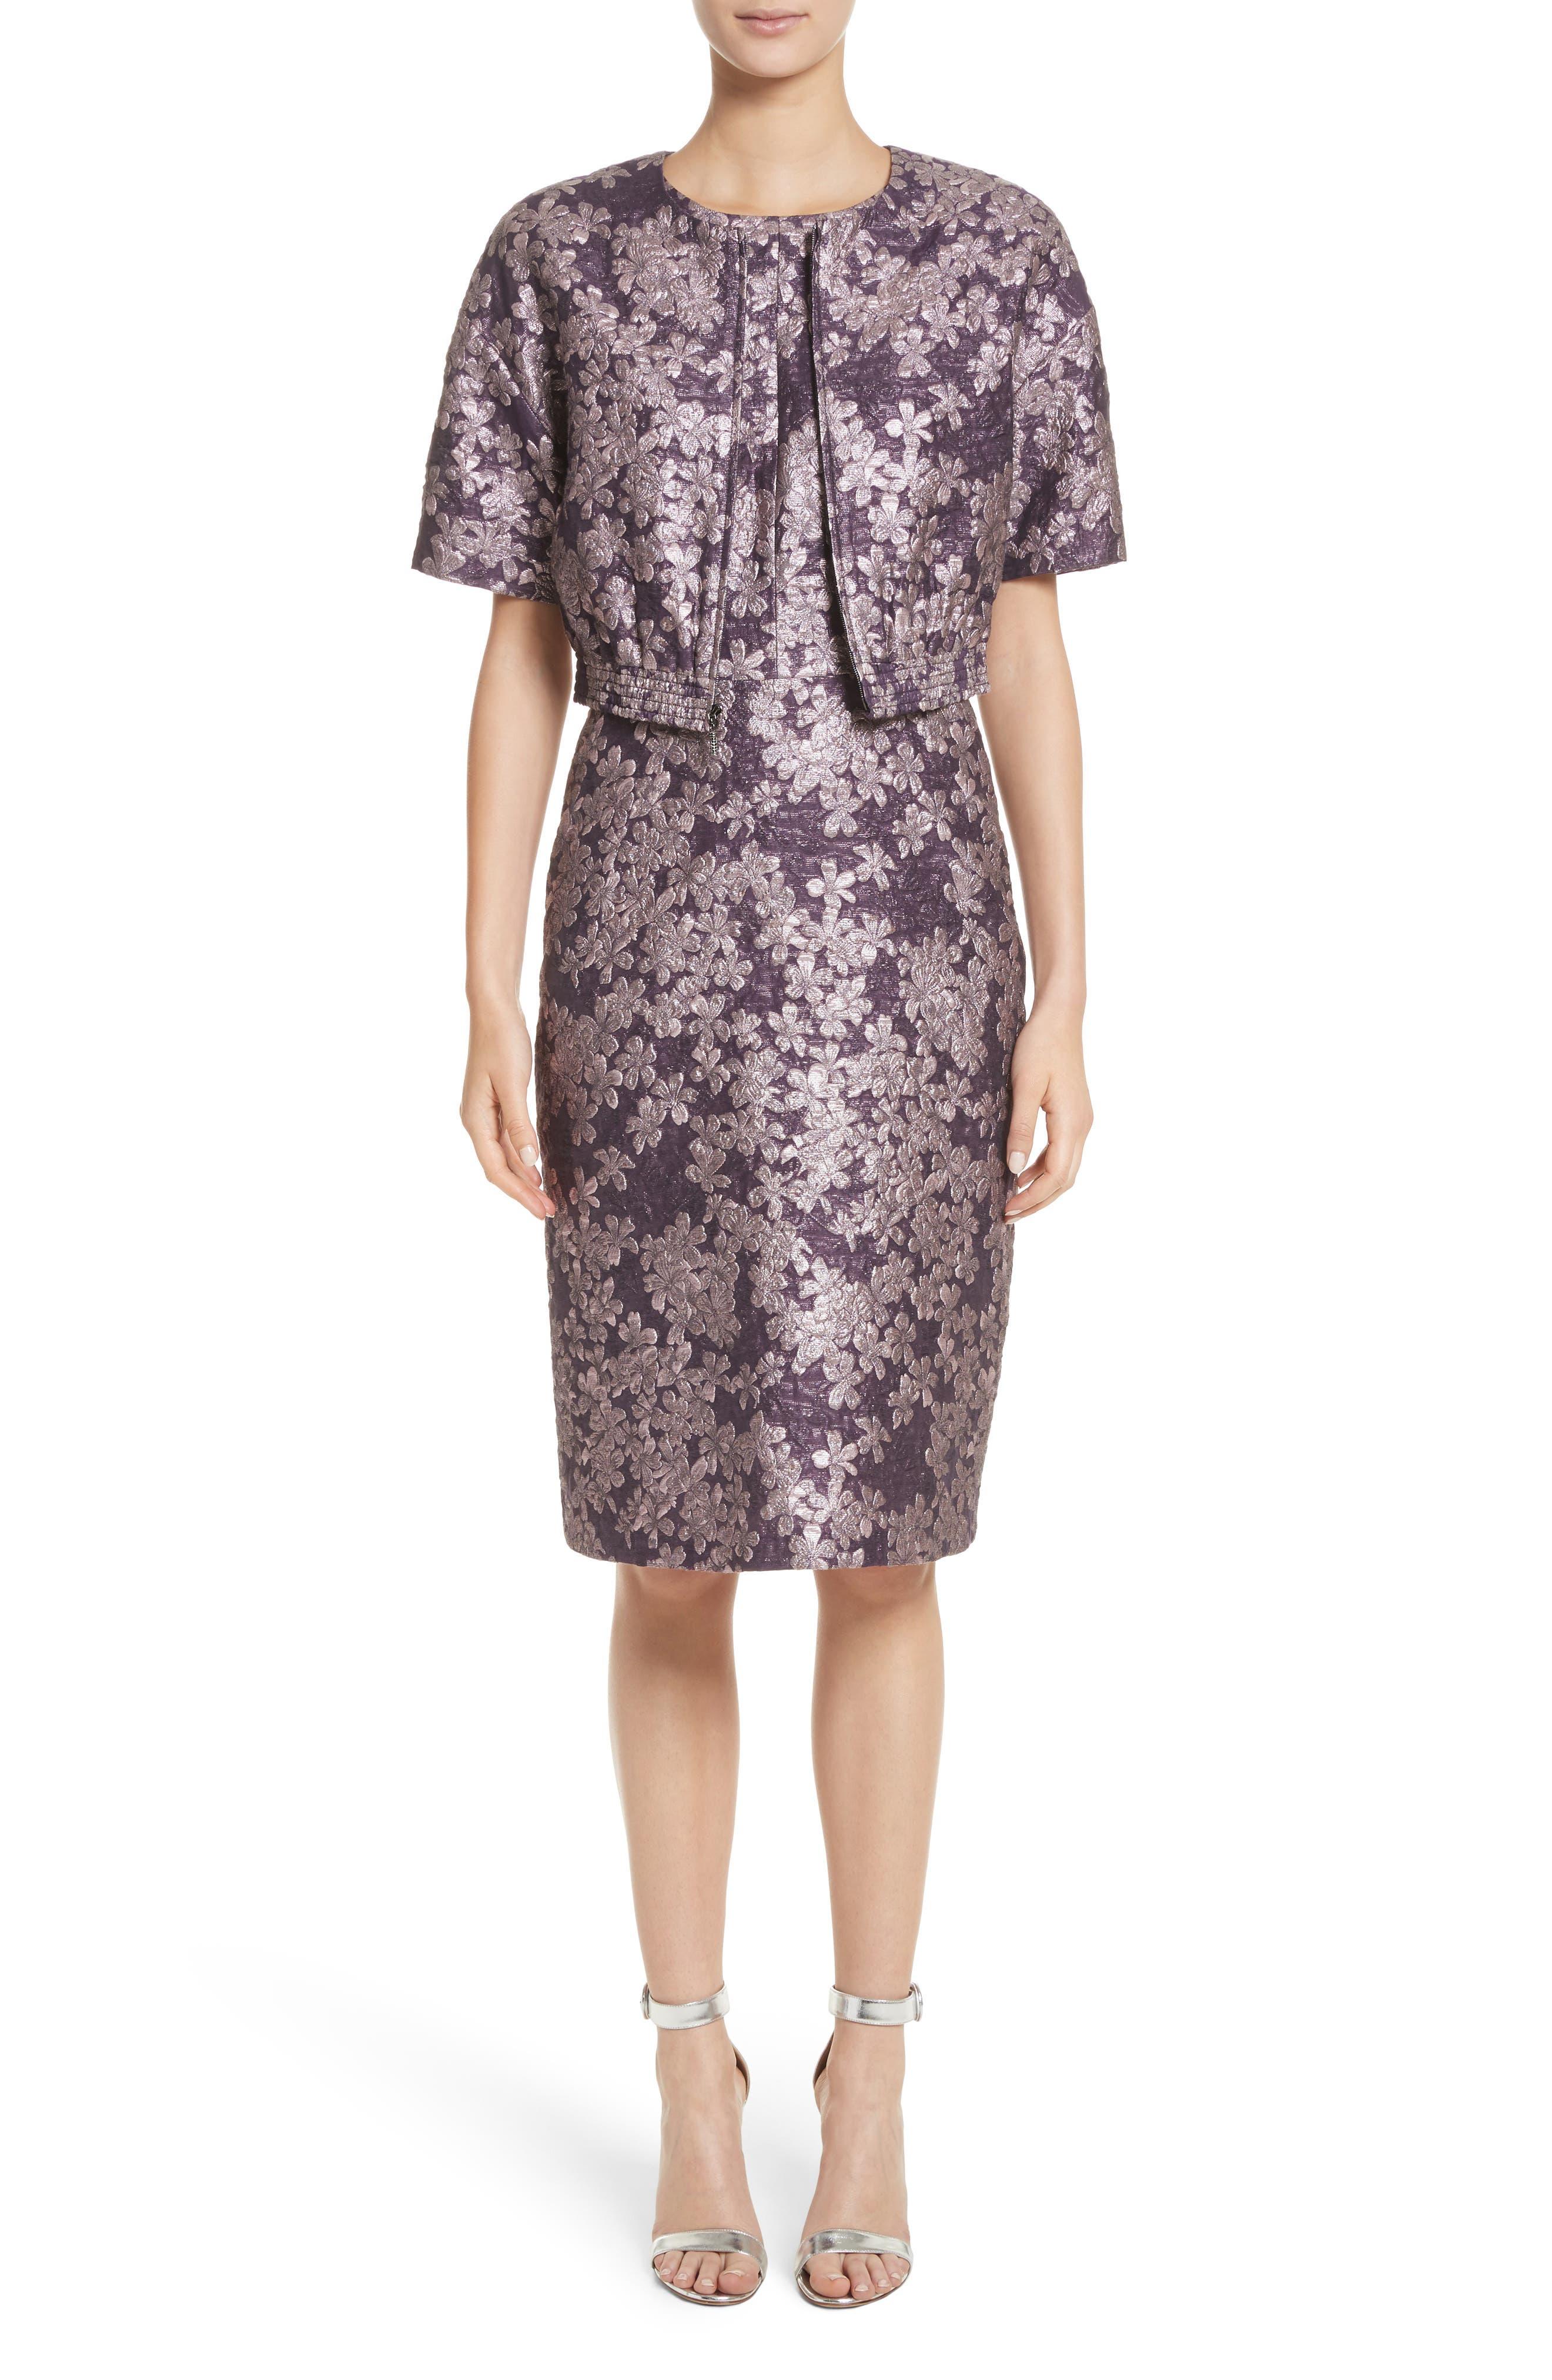 Metallic Floral Jacquard Dress,                             Alternate thumbnail 8, color,                             Orchid Multi